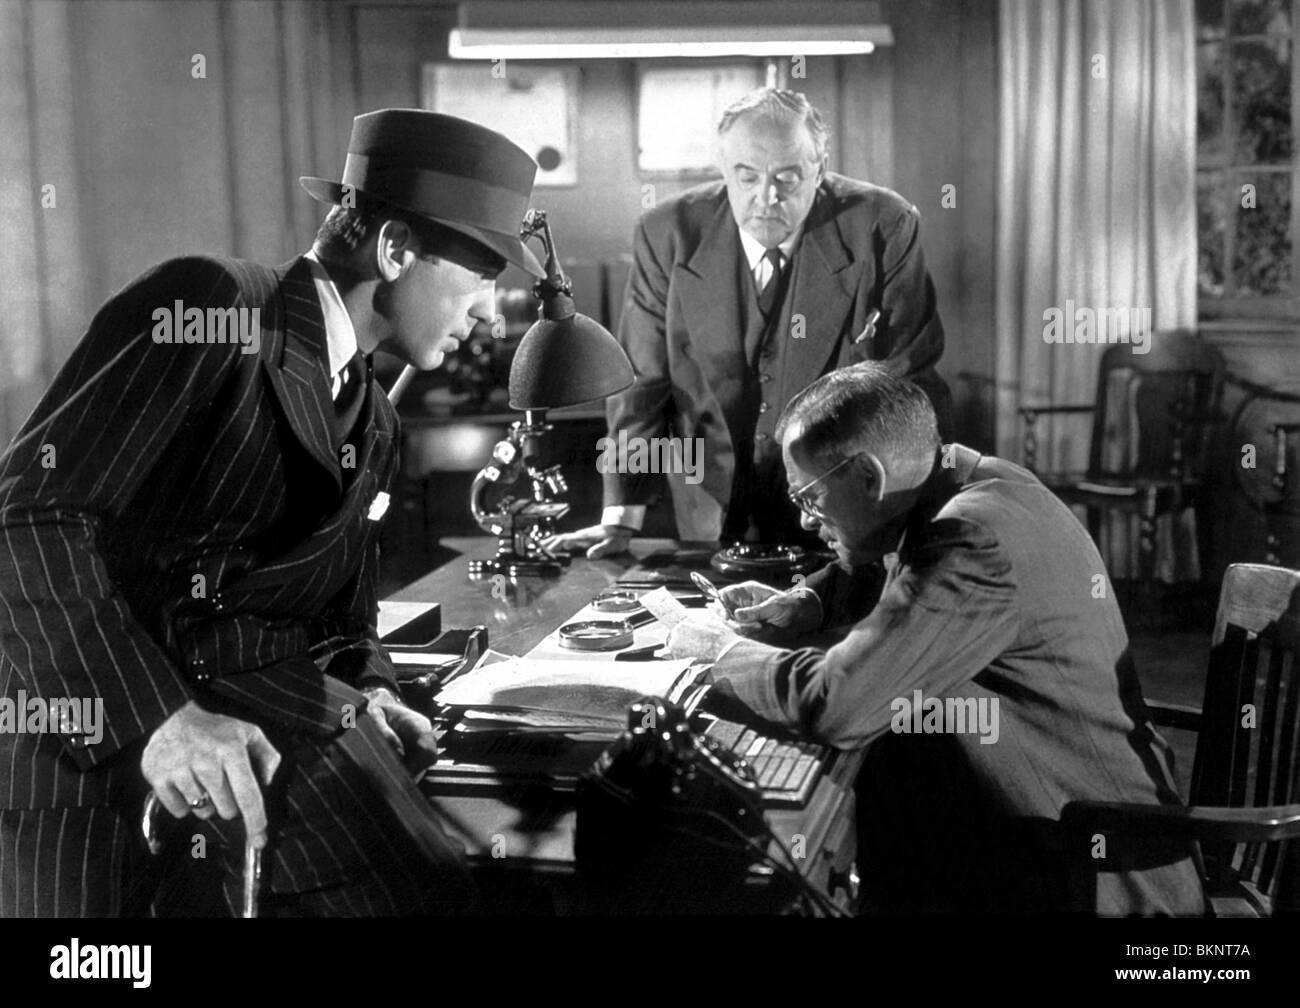 CONFLICT (1945) HUMPHREY BOGART, SYDNEY GREENSTREET CFLT 002 - Stock Image